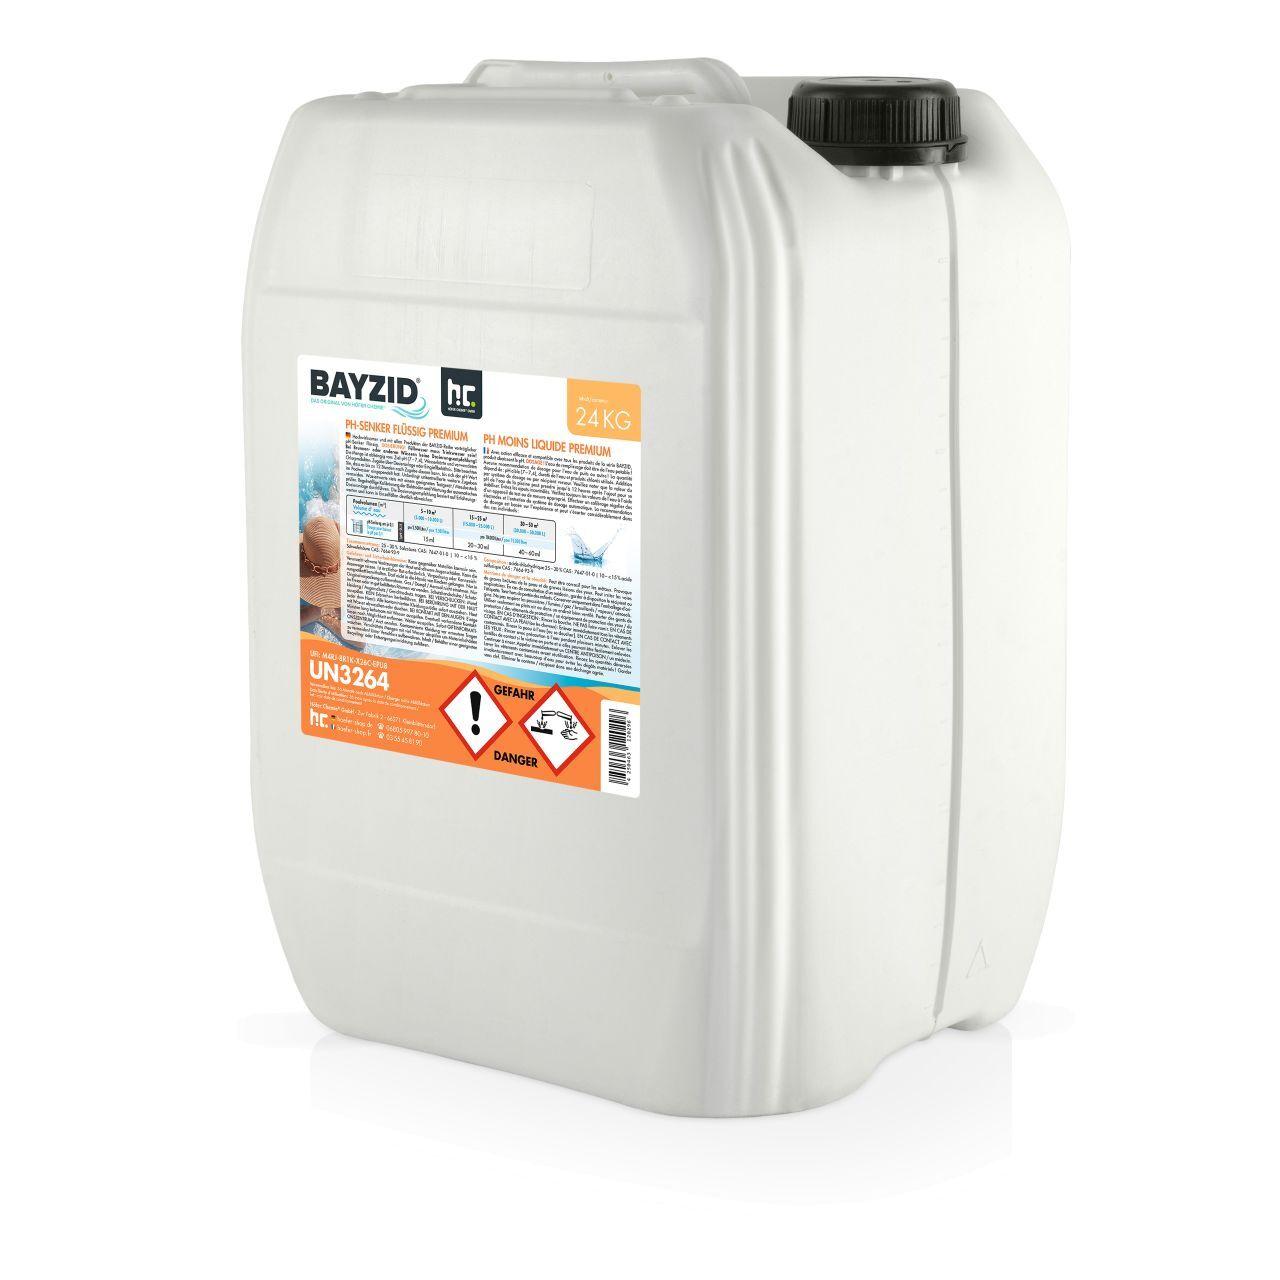 BAYZID 48 kg Bayzid® pH moins liquide (2 x 24 kg)